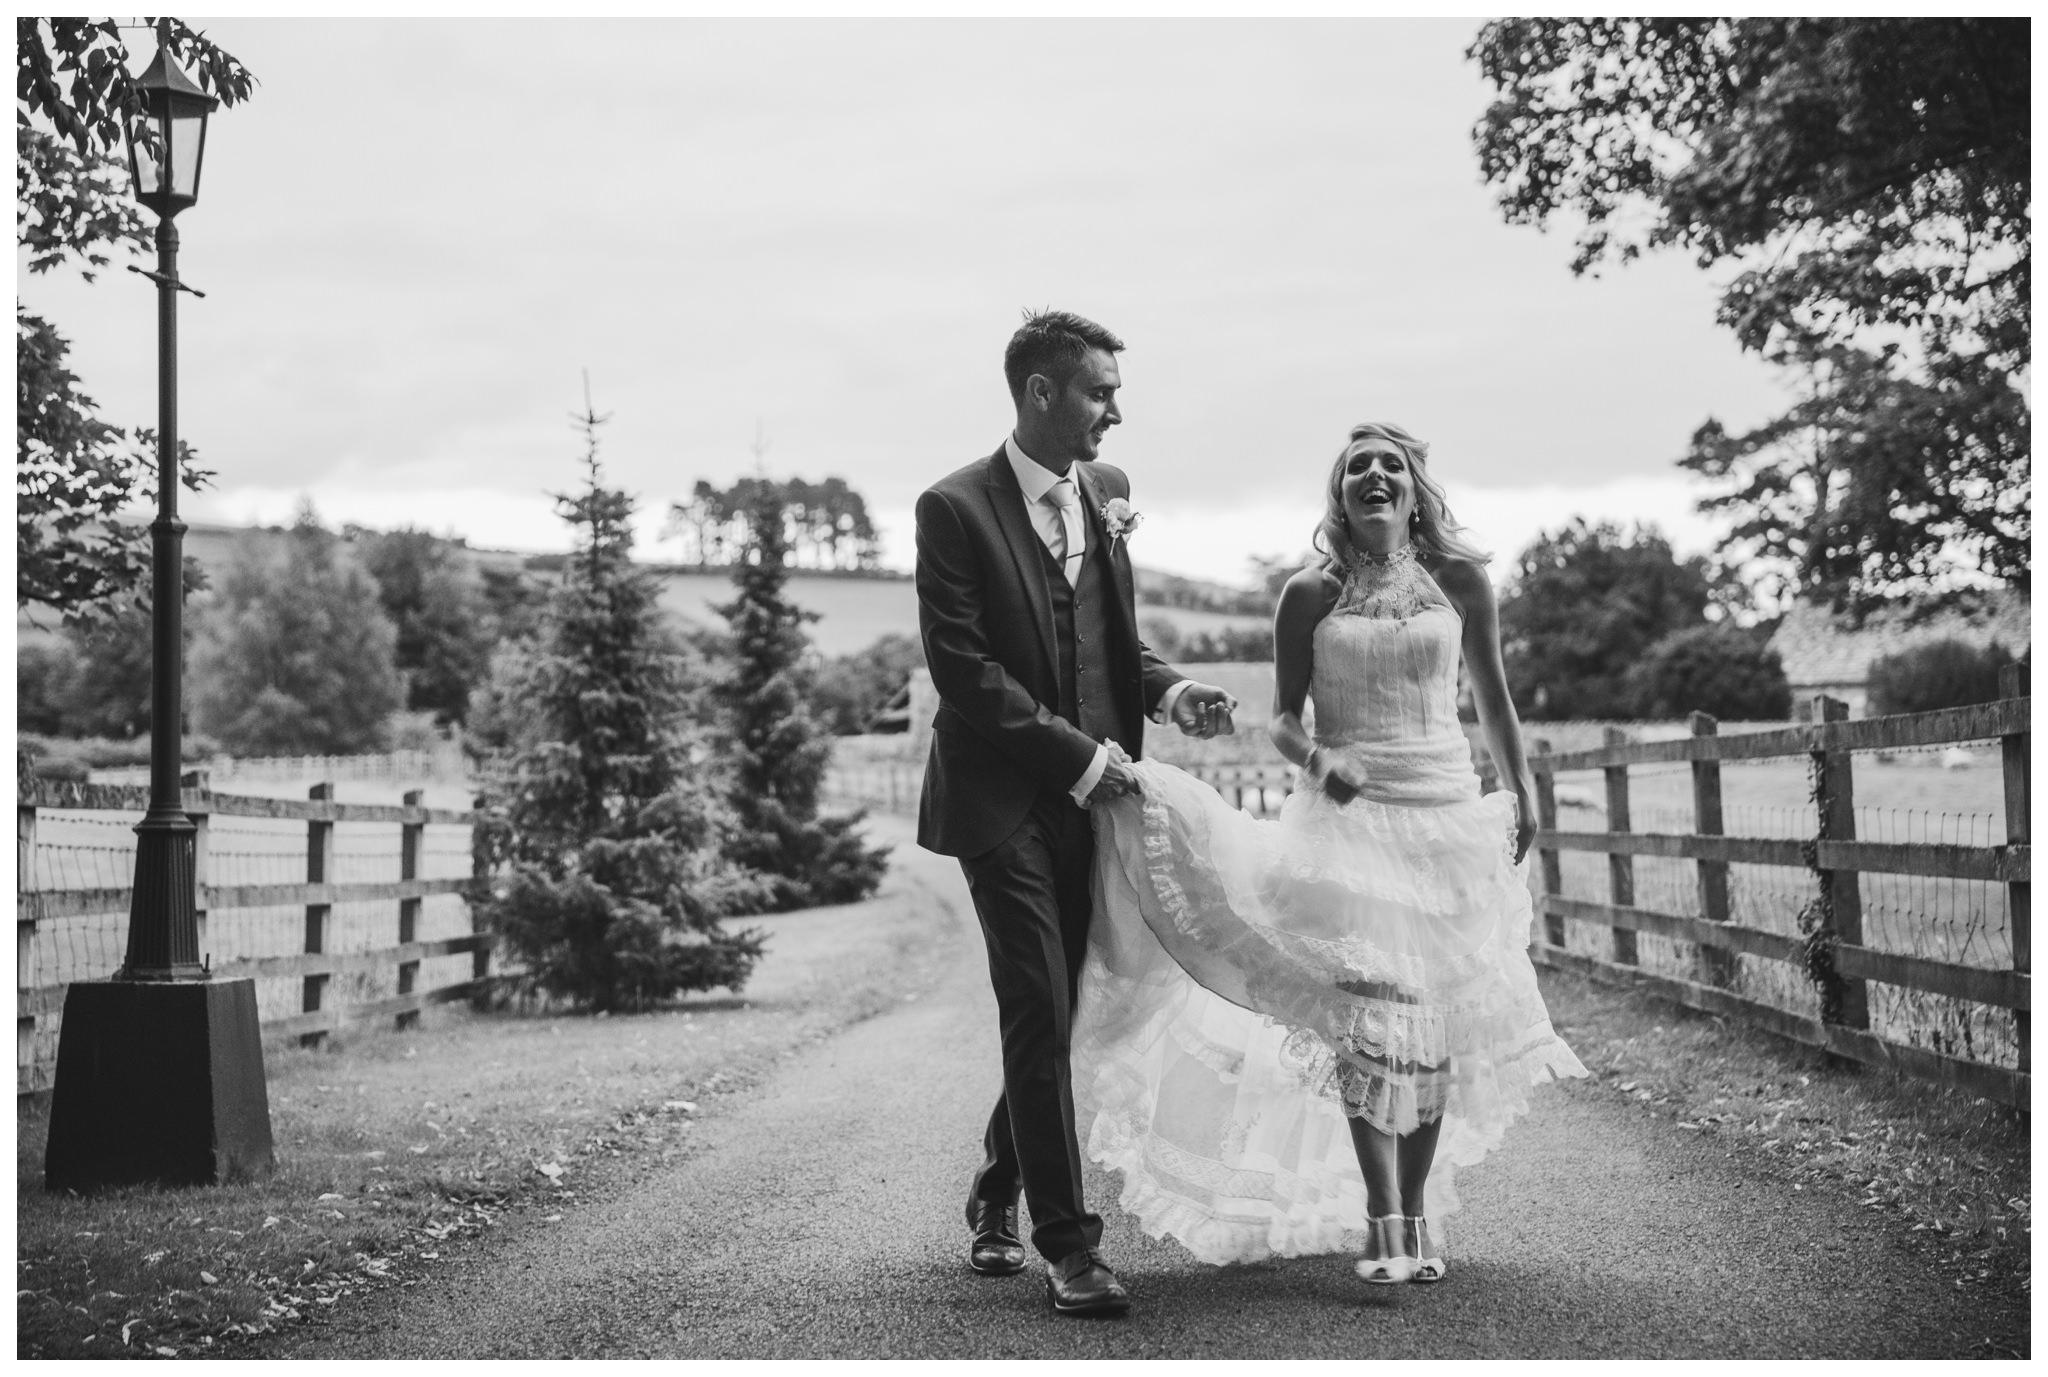 Richard Savage Photography - Wedding - Peterstone Court Brecon - 2016-05-11_0061